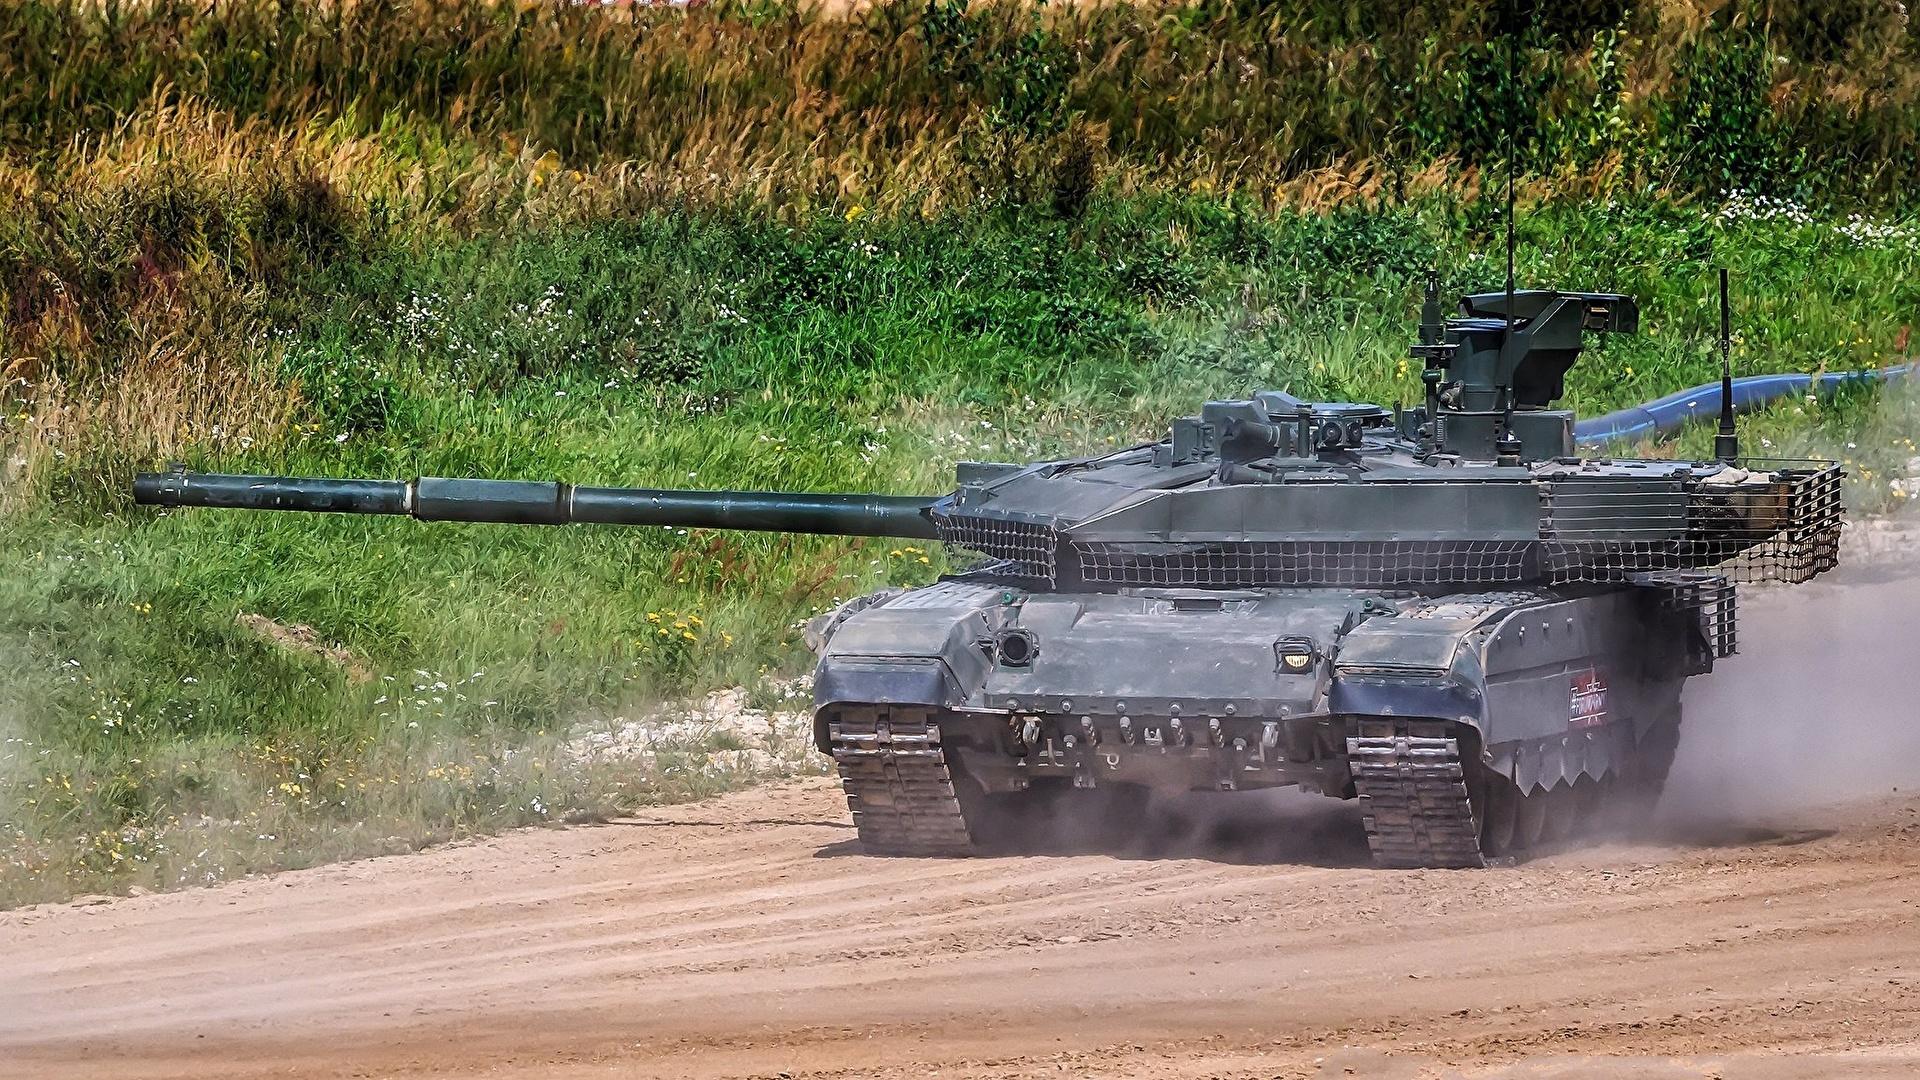 Image Tanks Russian T-90M military 1920x1080 tank Army